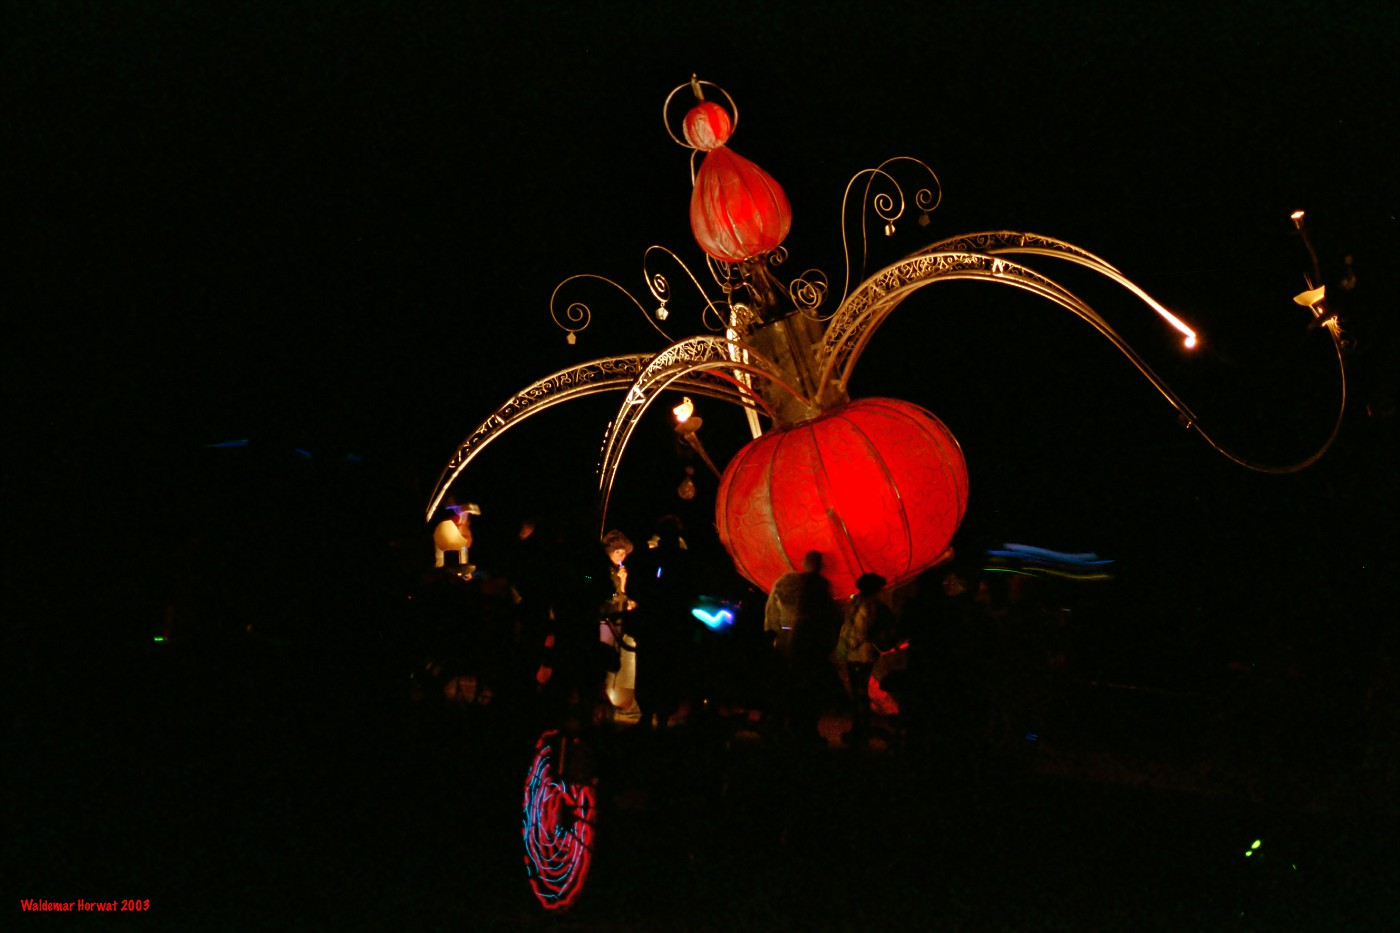 Chandelier at Night